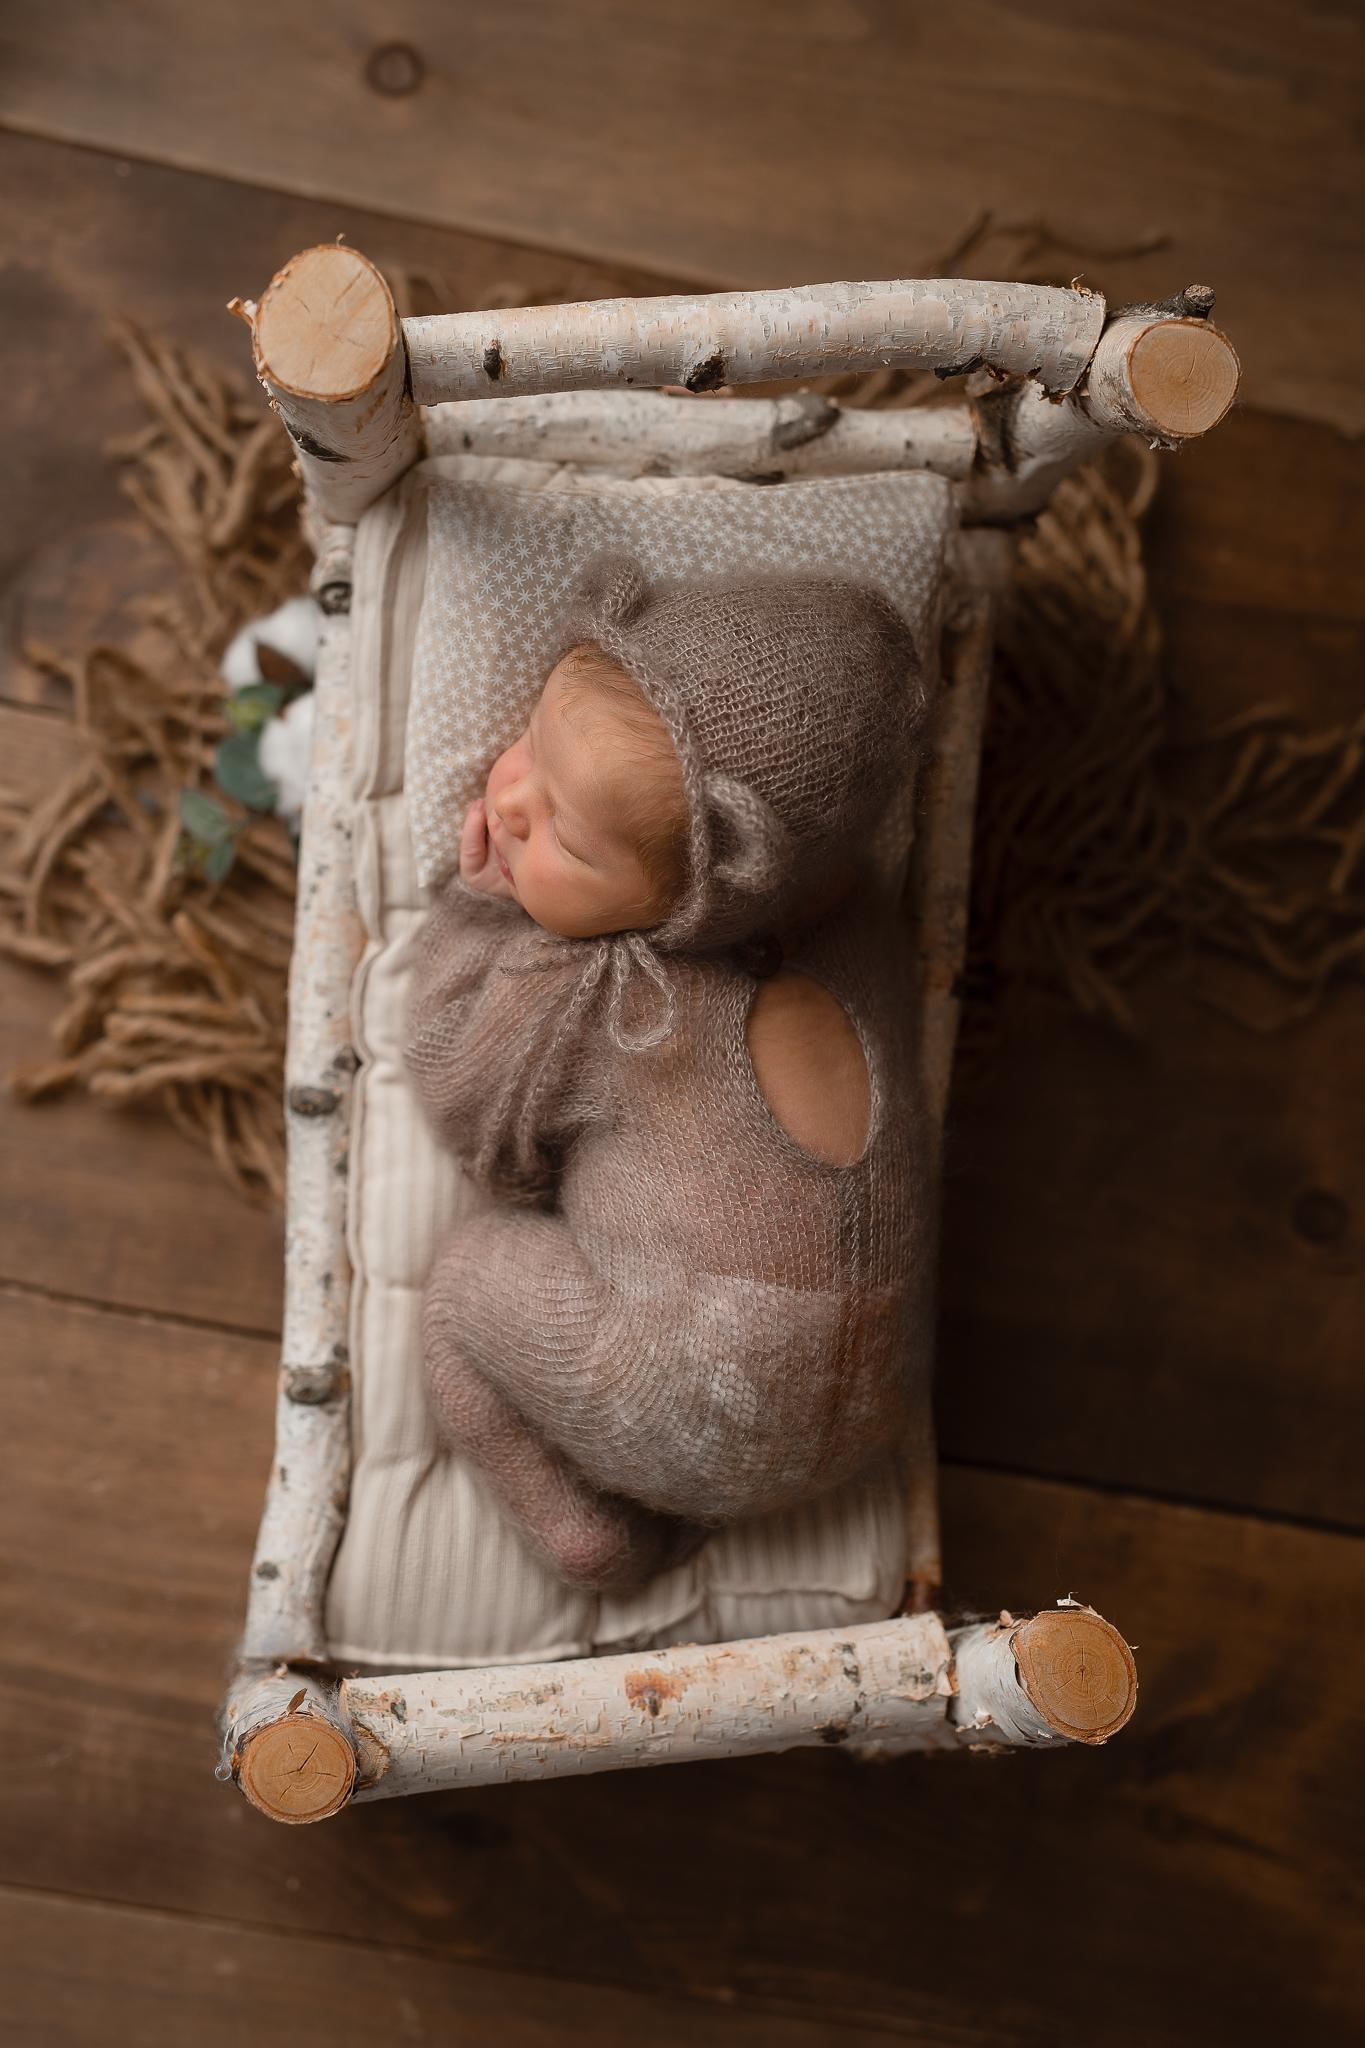 Newborn158NaomiLuciennePhotography062019-2-Edita.jpg